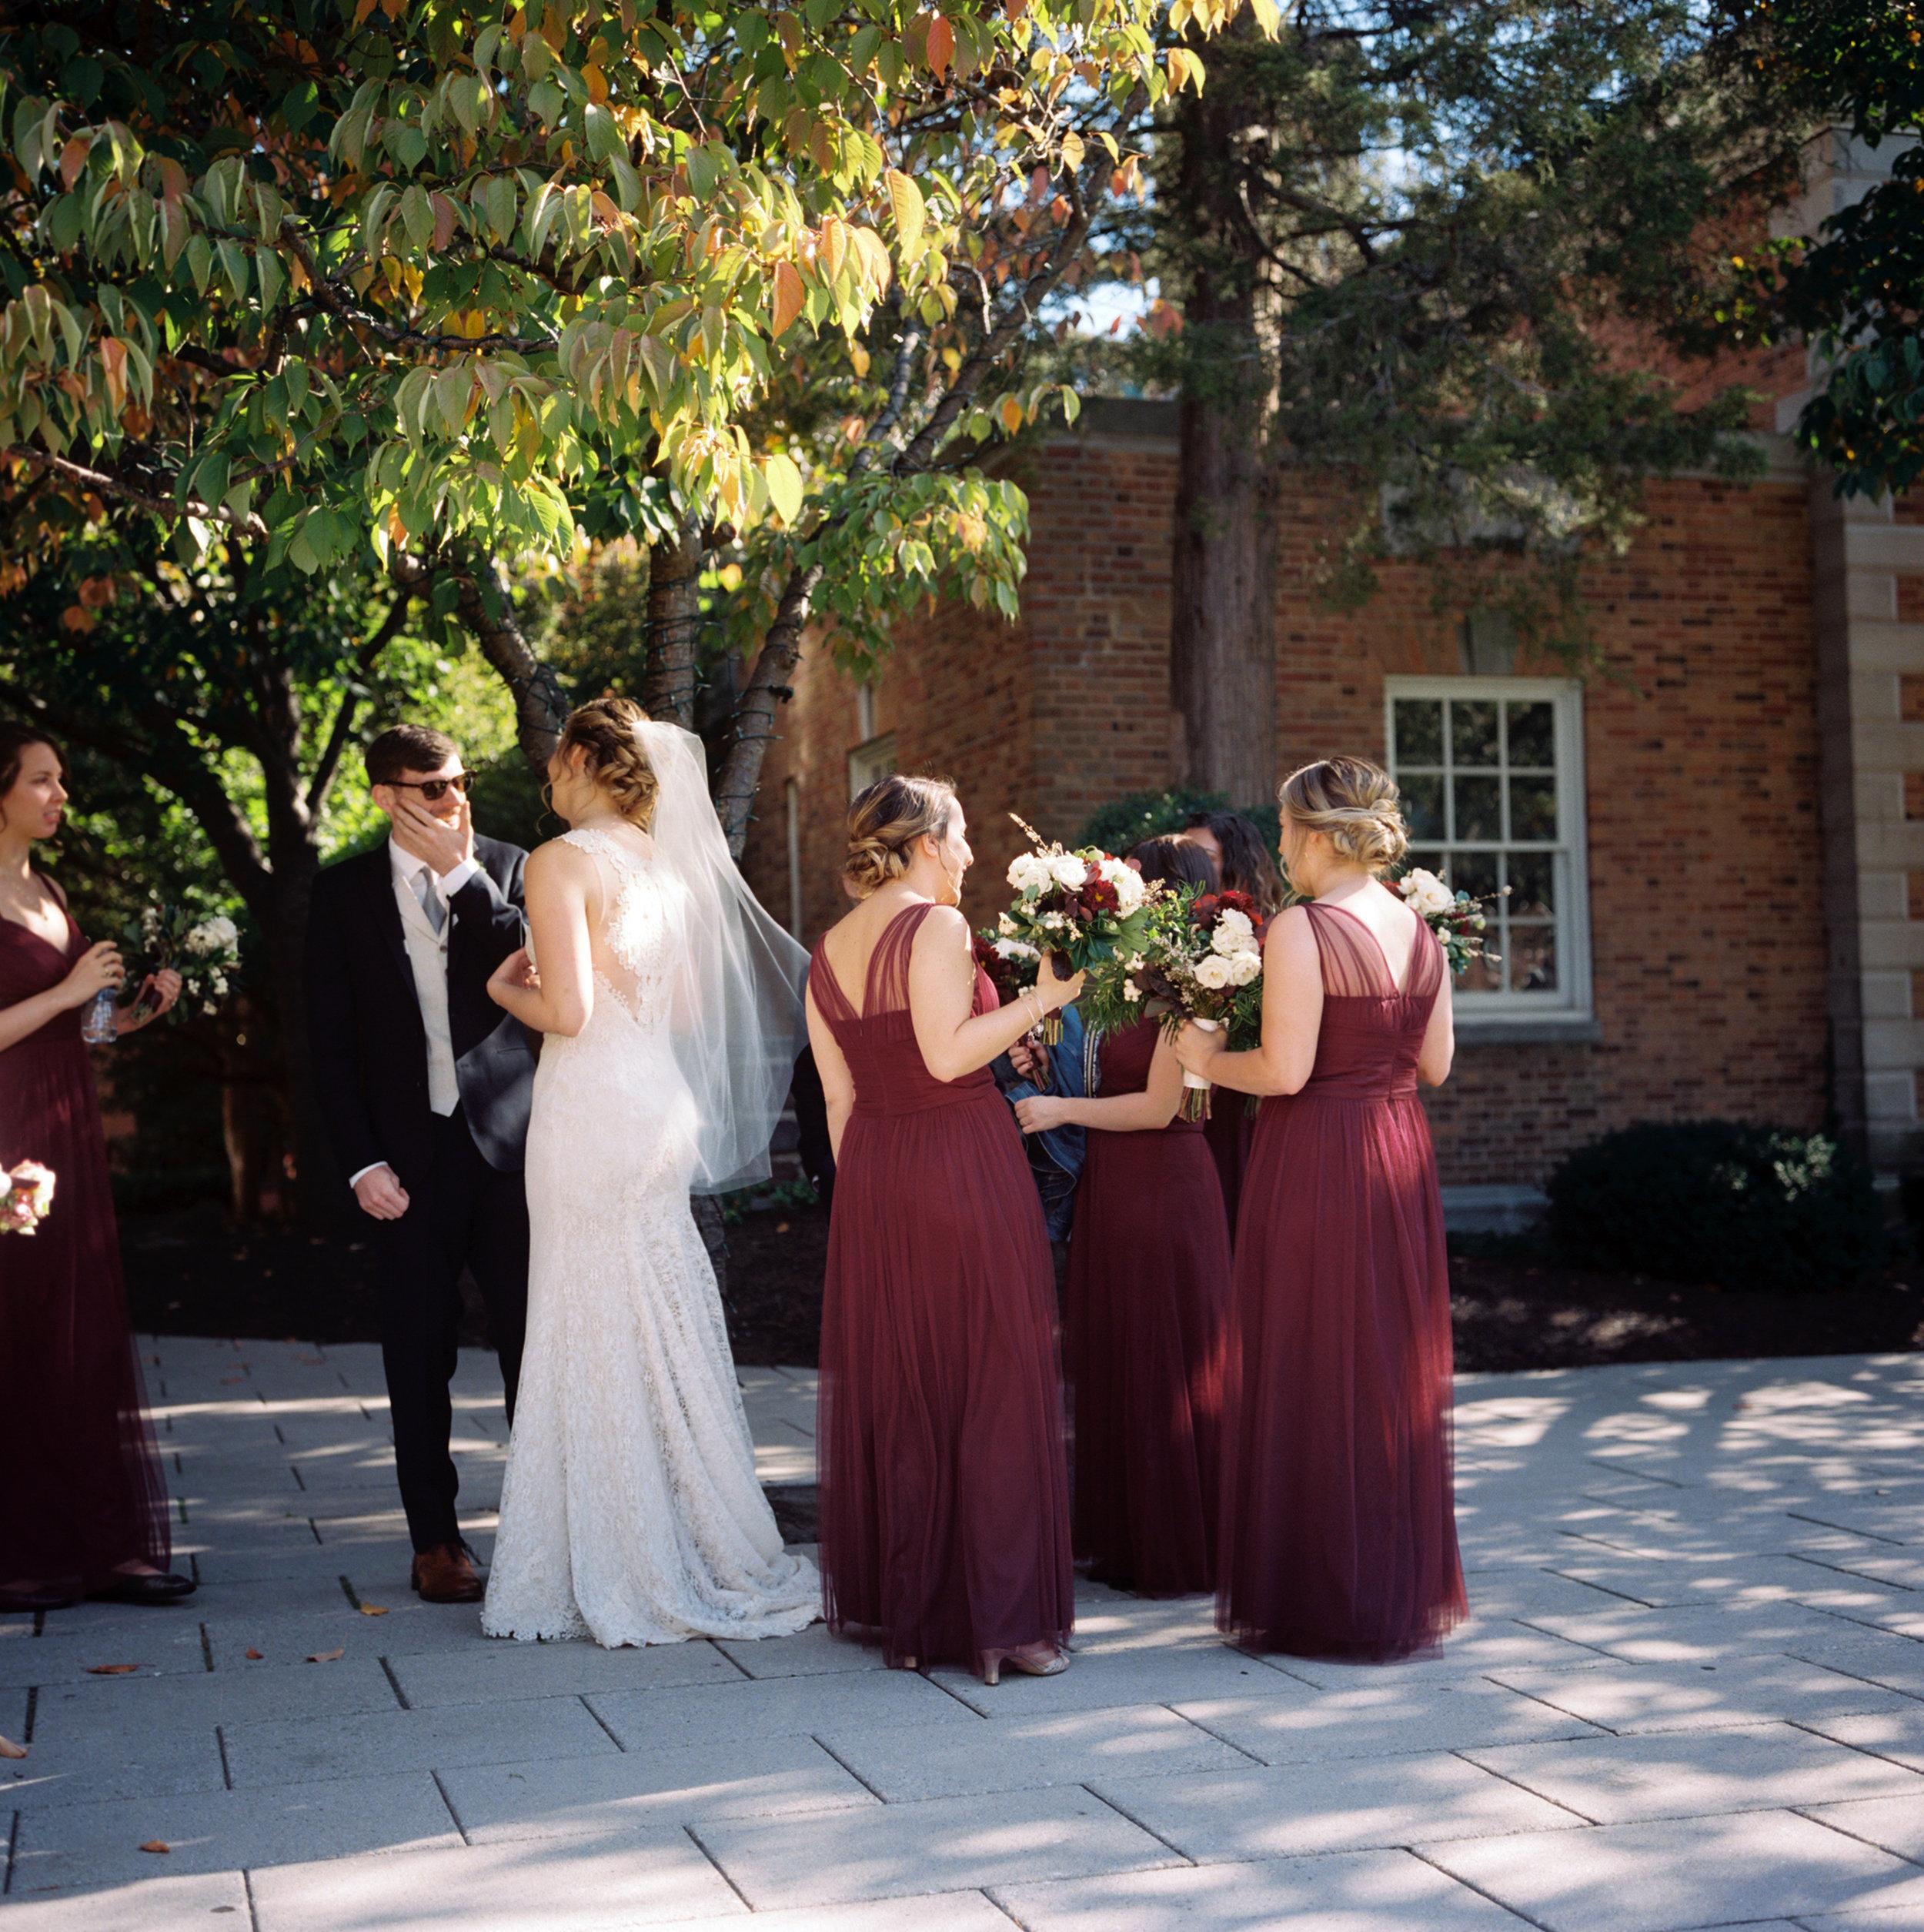 Chelsea+James- October Wedding-Triumph Brewery Princeton New Jersey- FILM-Olivia Christina Photo-3.JPG